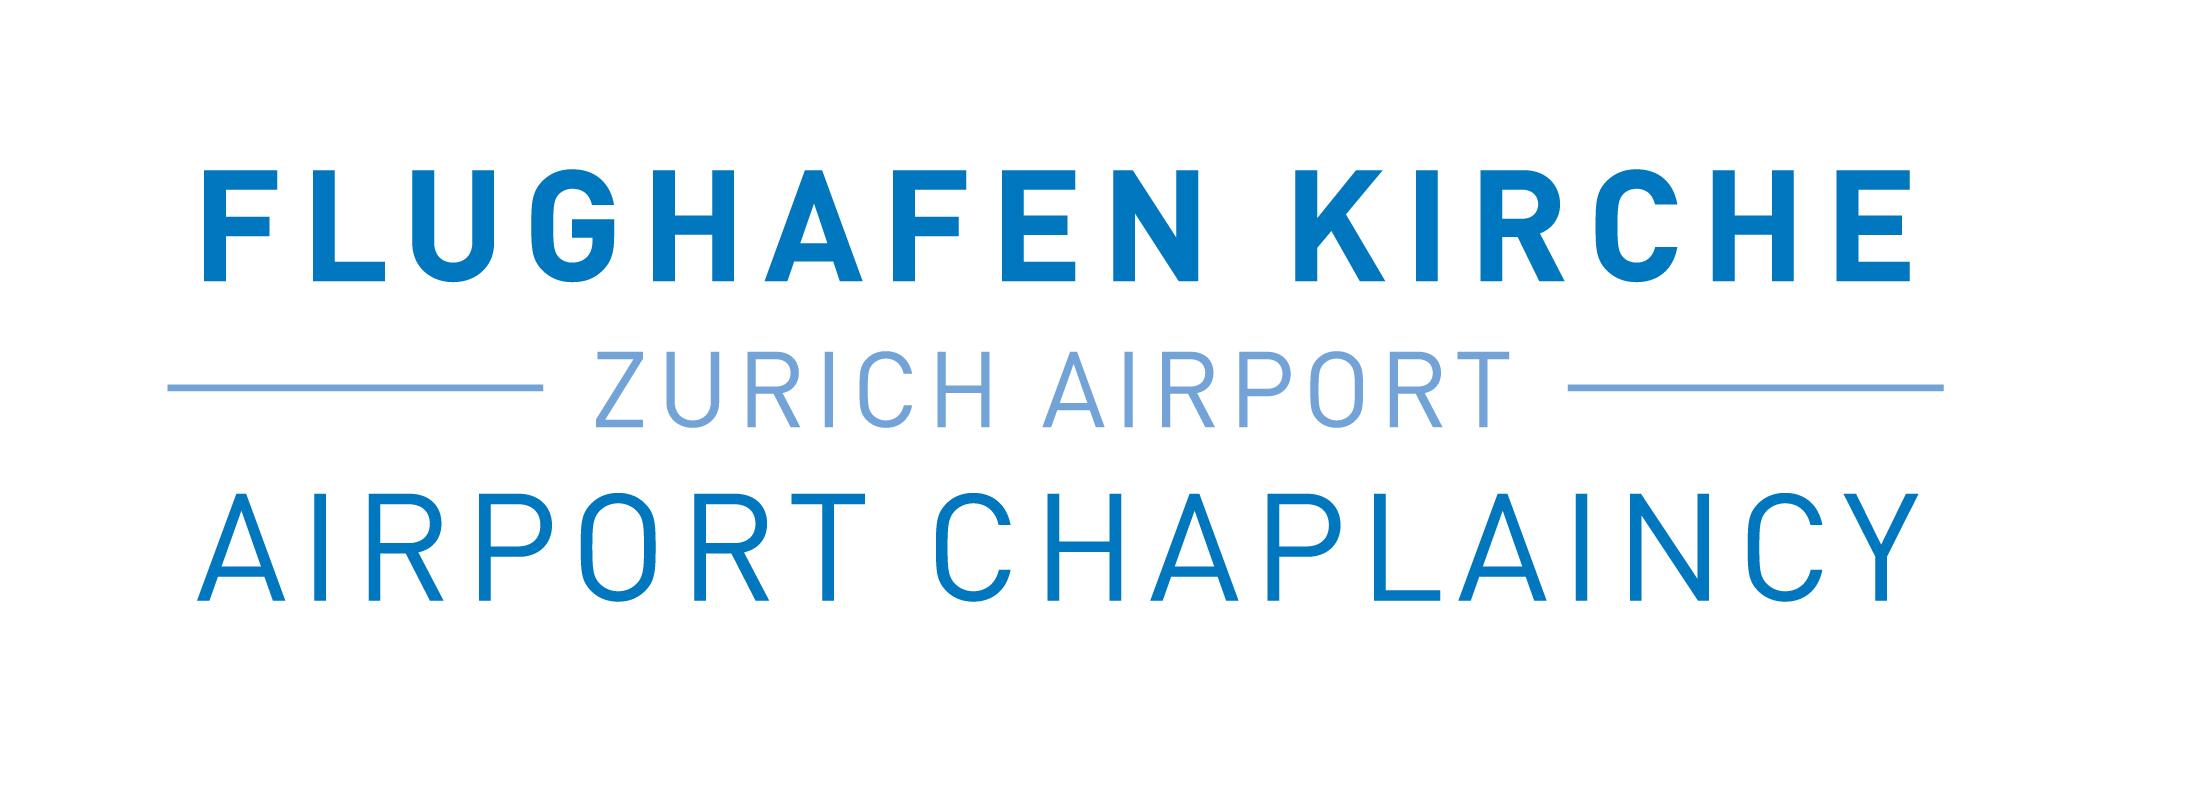 Flughafen Kirche